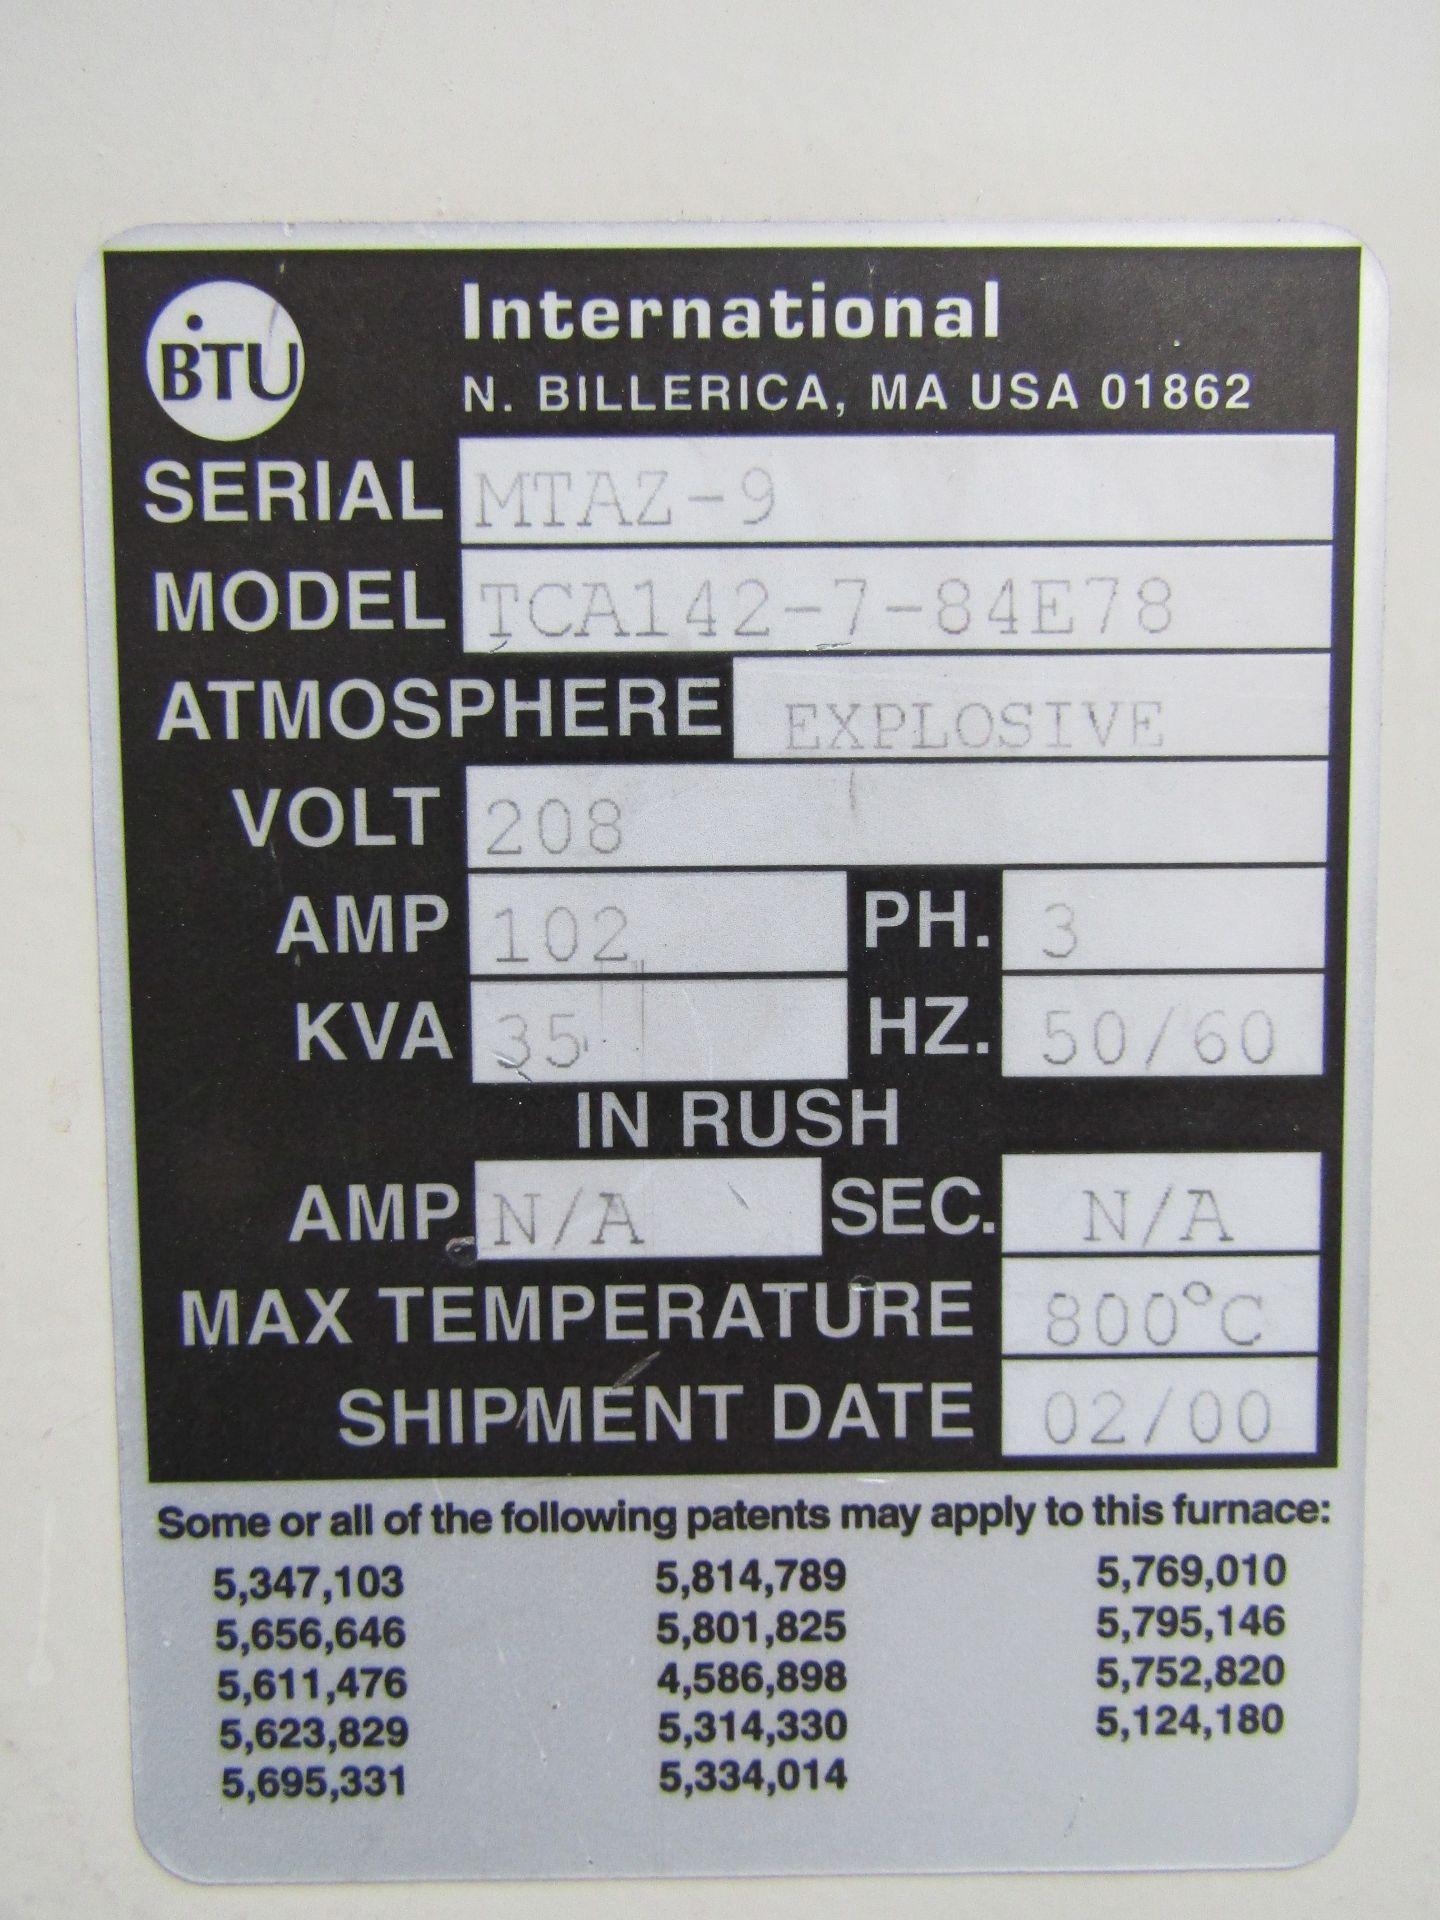 Lot 12 - 2000 BTU INTERNATIONAL Annealing Furnace, Model TCA142-7-84E78, Serial MTAZ-9, Max Temp 800 C